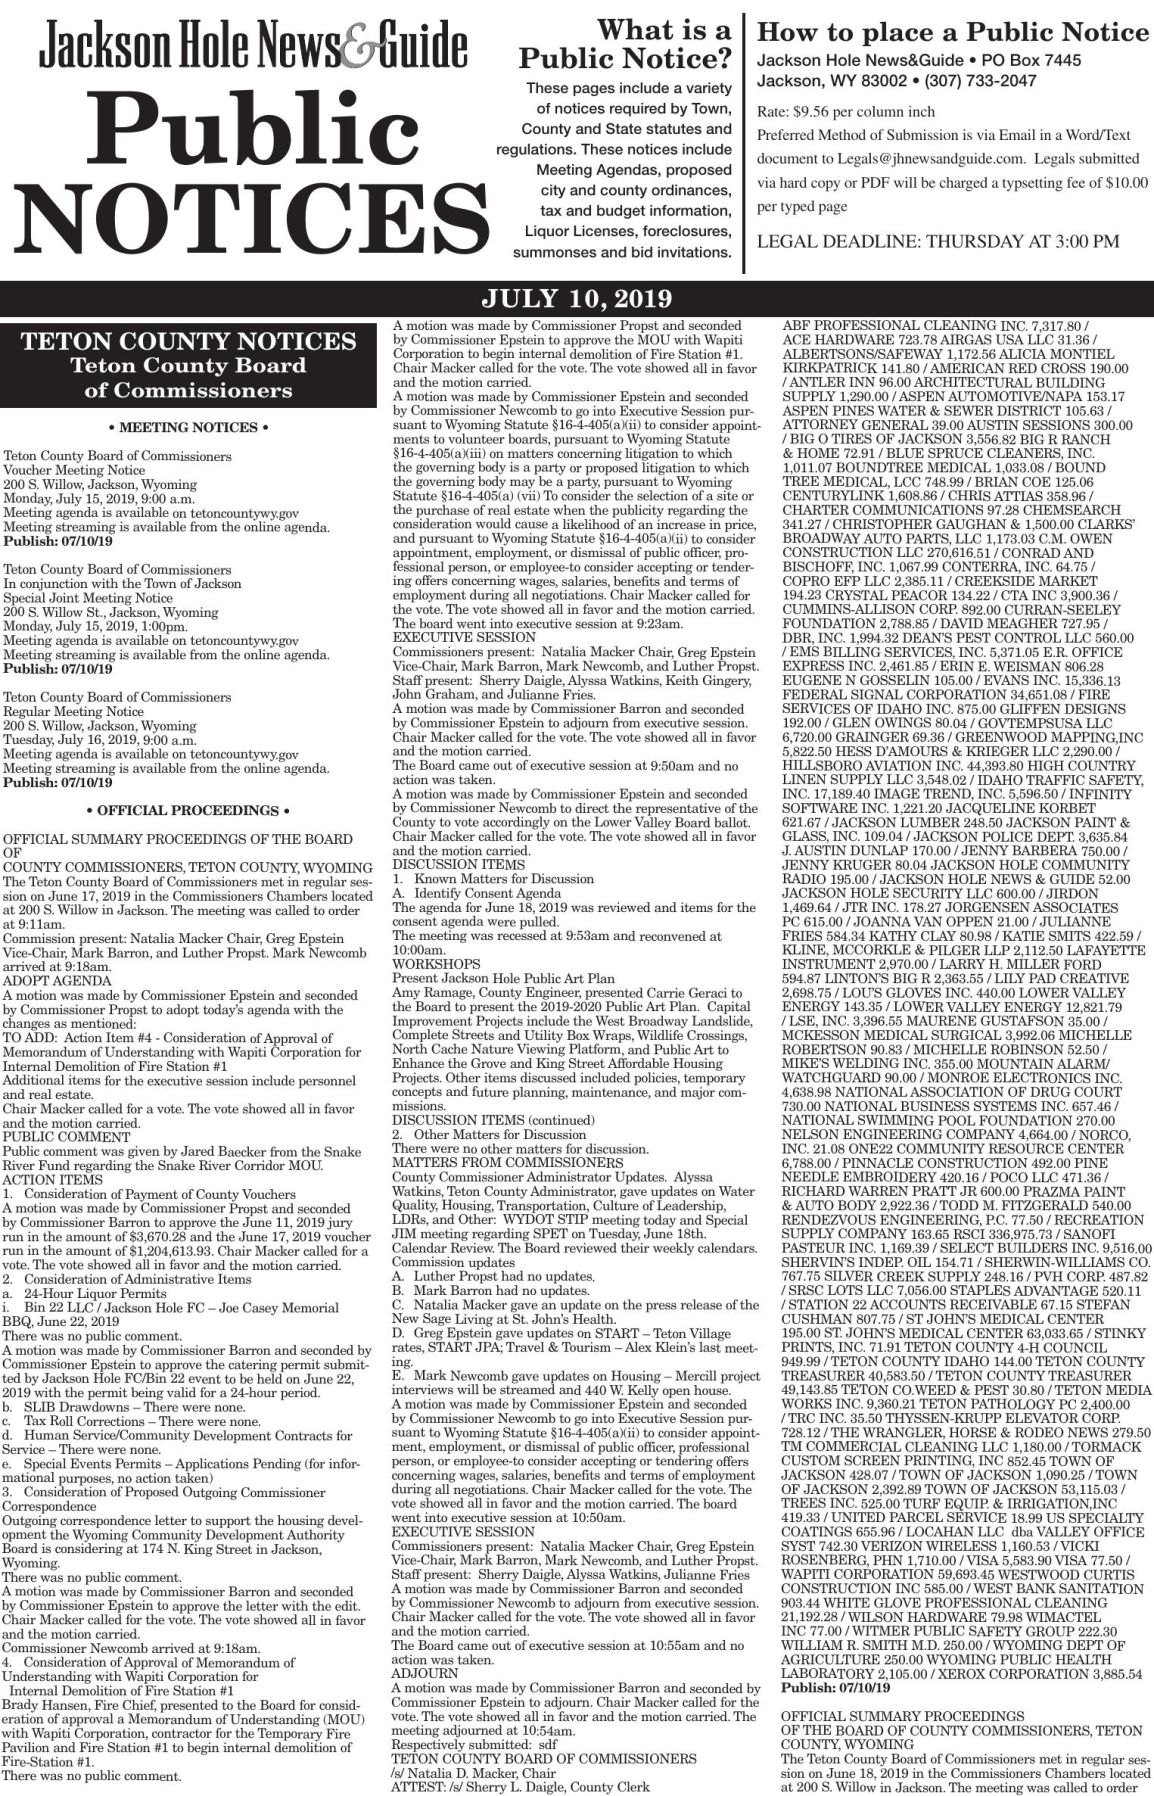 Public Notices, July 10, 2019